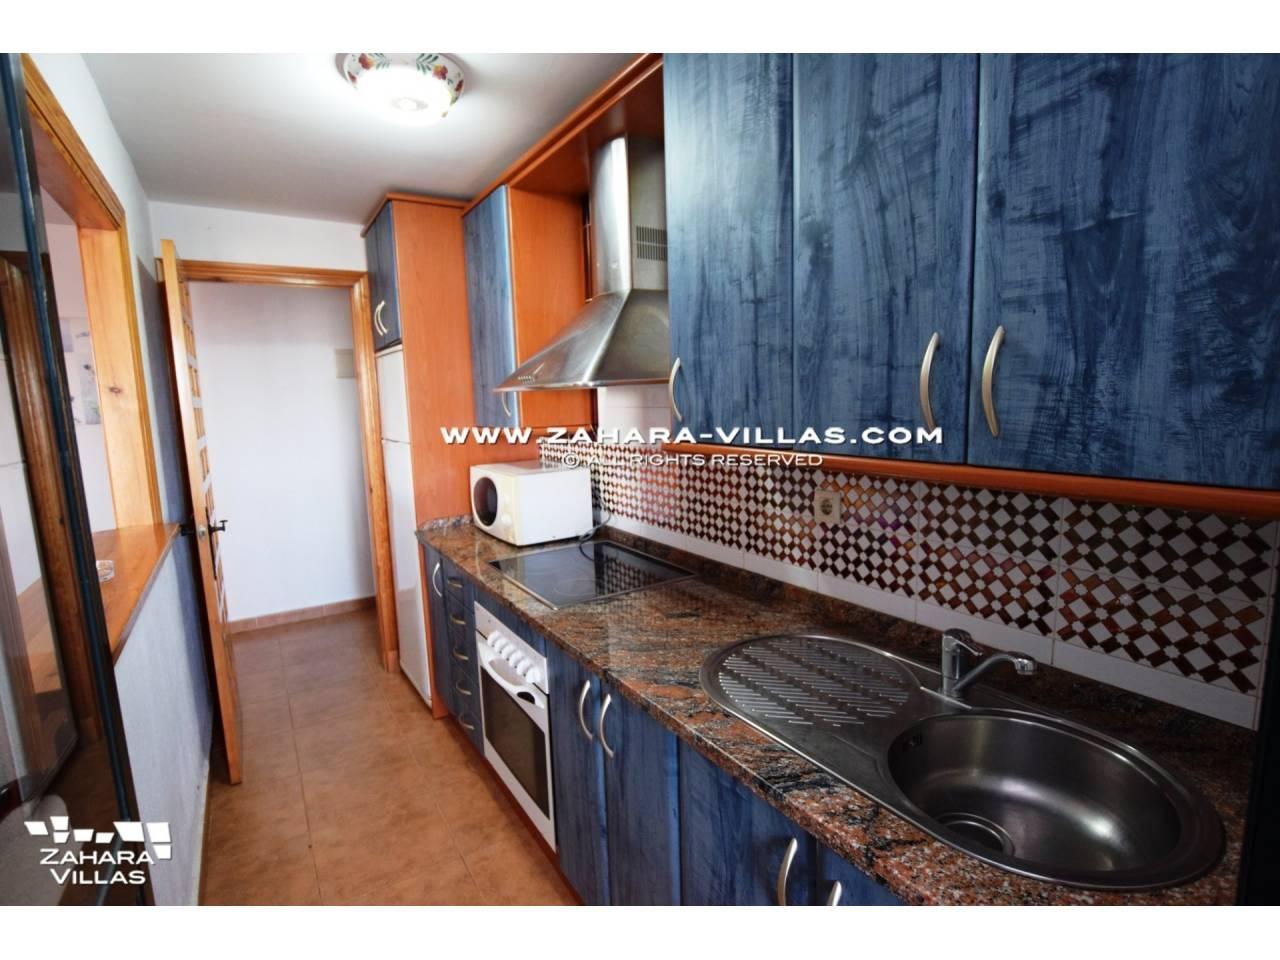 Imagen 8 de Penthouse for sale in Zahara de los Atunes